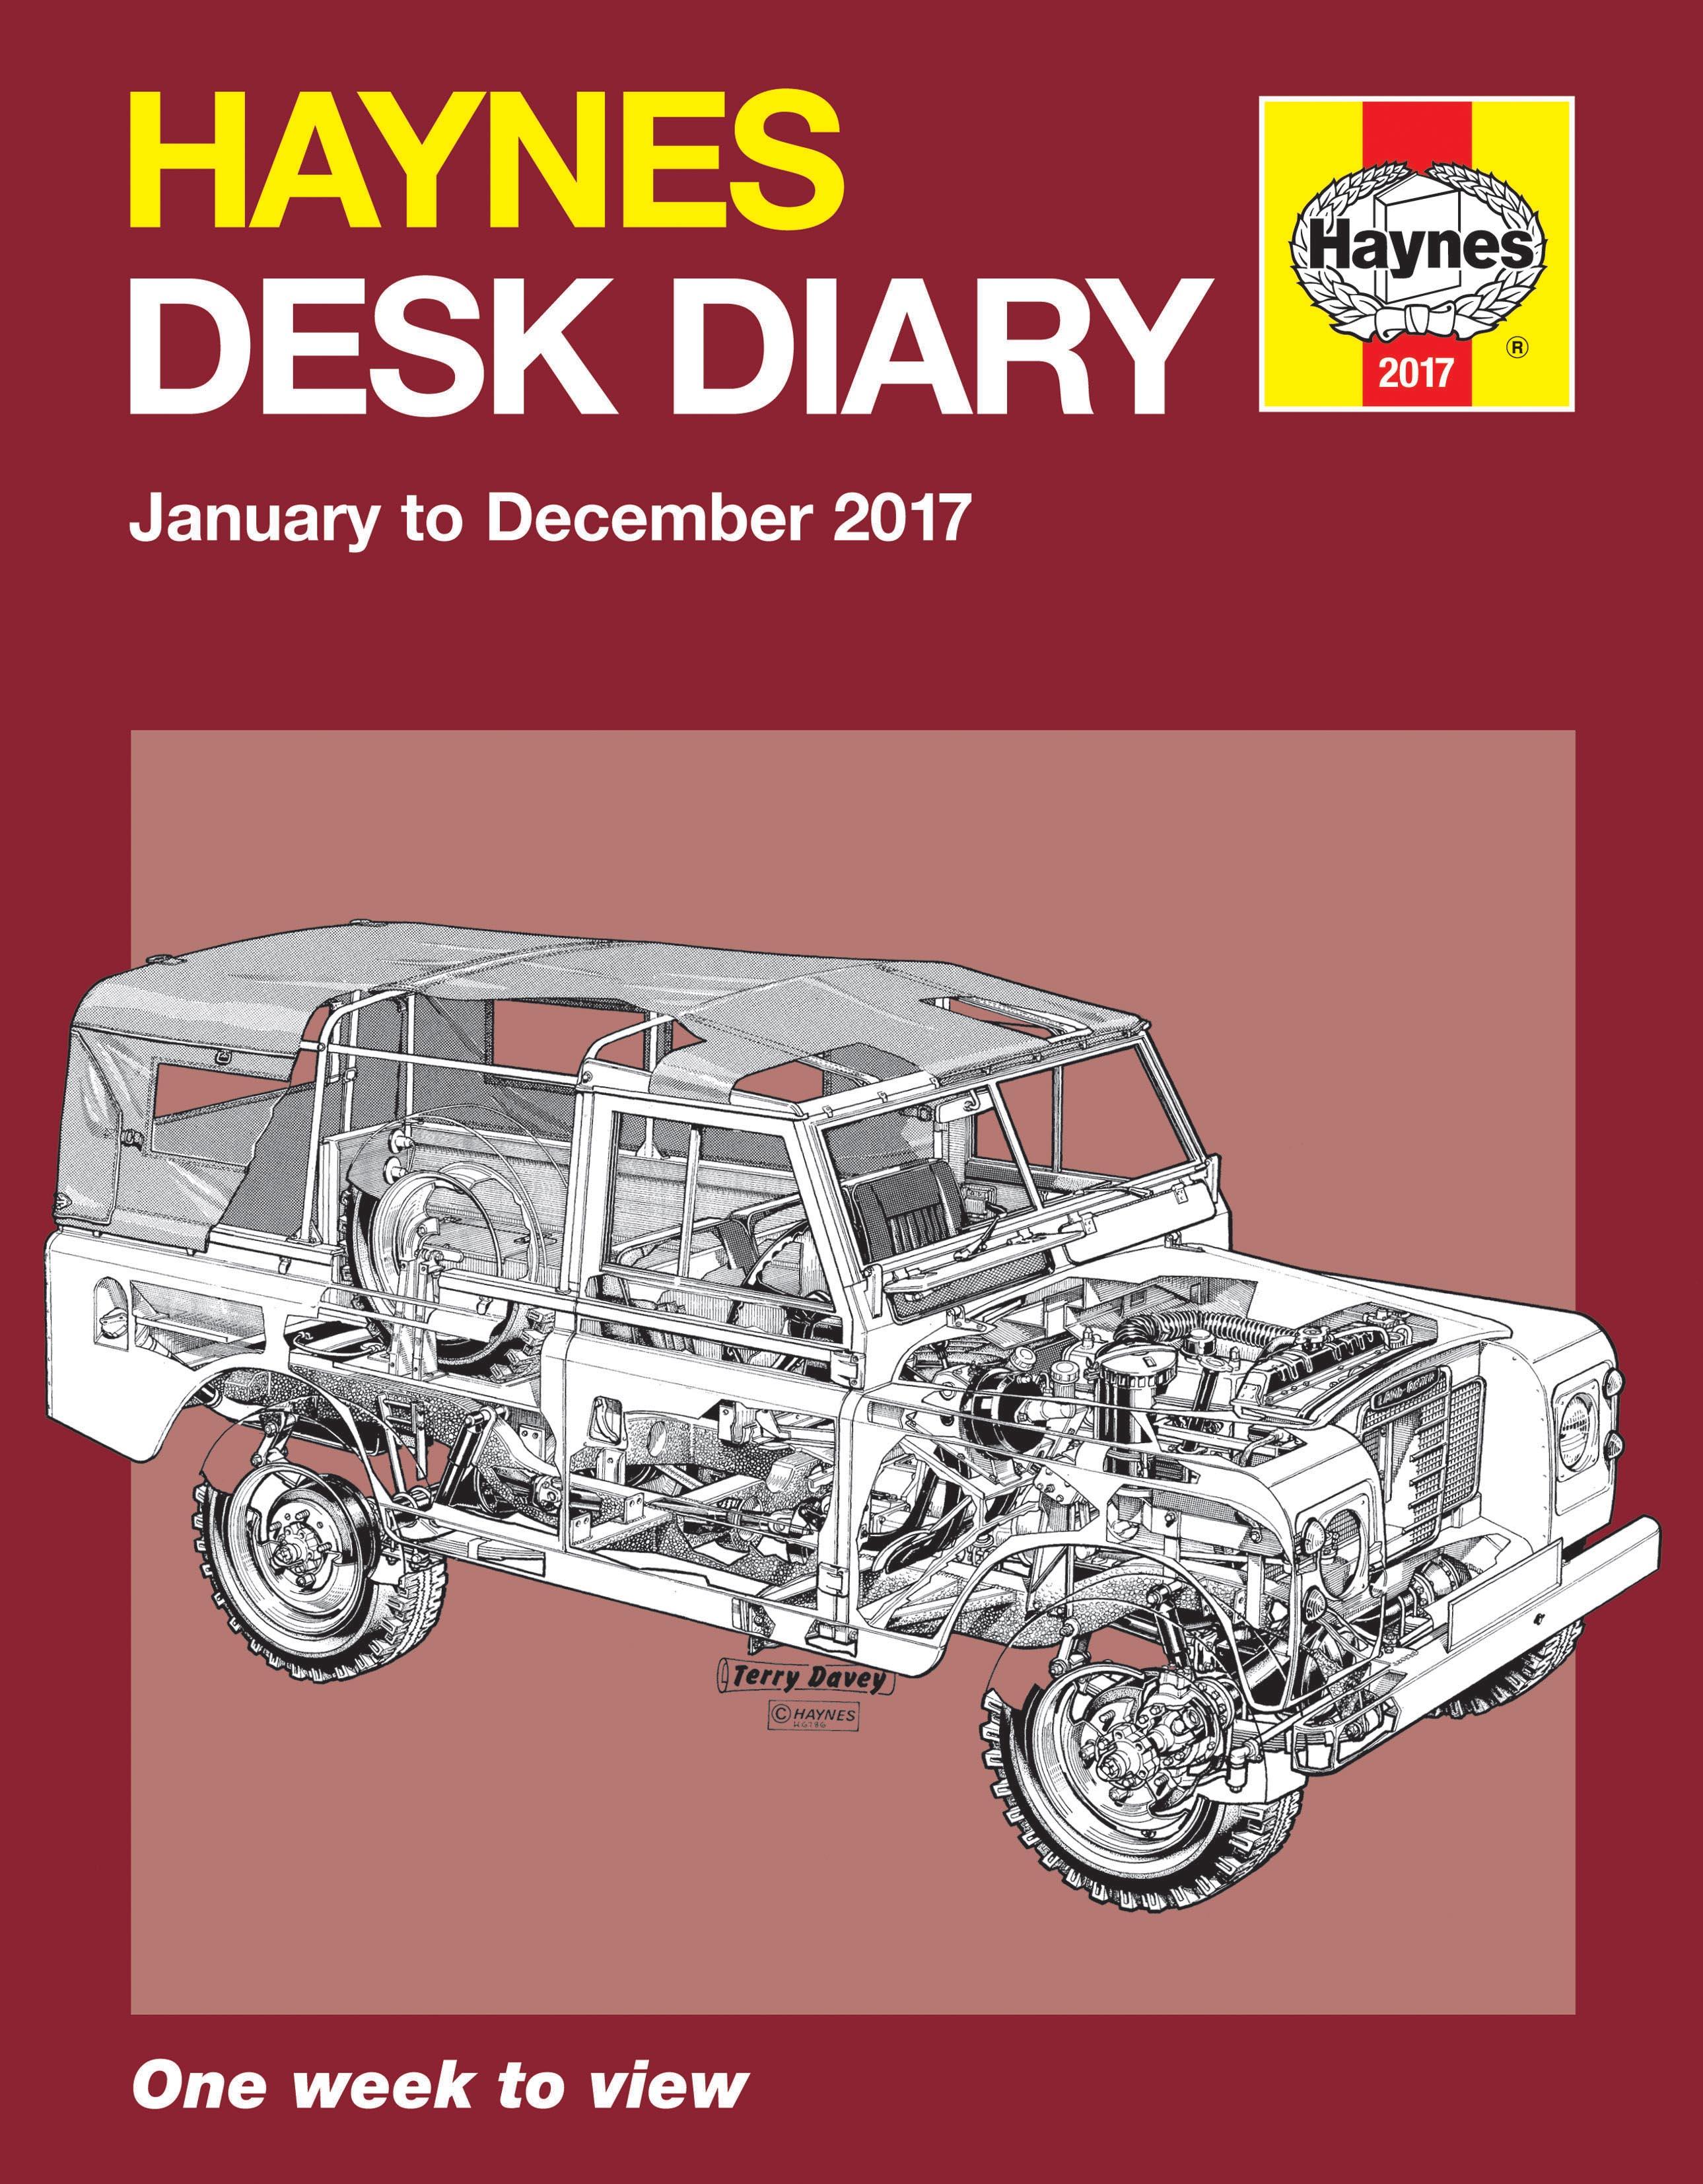 Haynes Desk Diary 2017